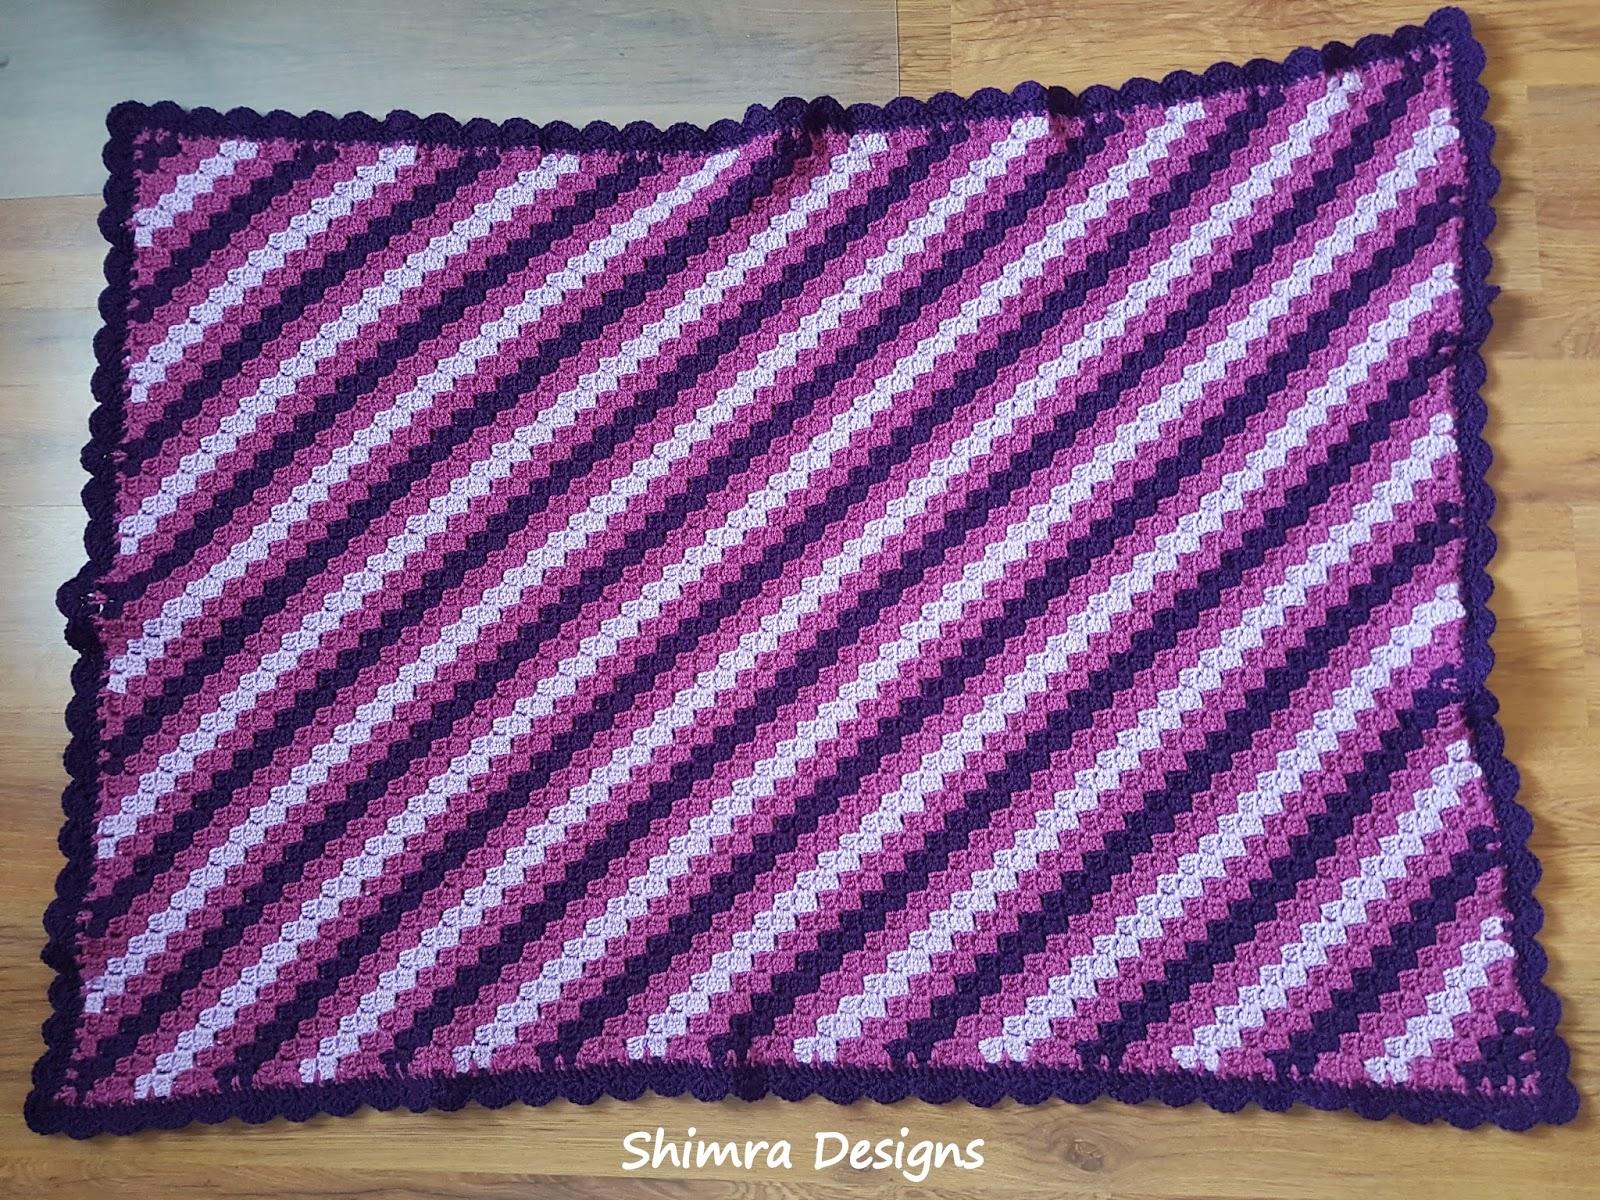 Shimra Designs C2c Crochet Baby Blanket In Purple